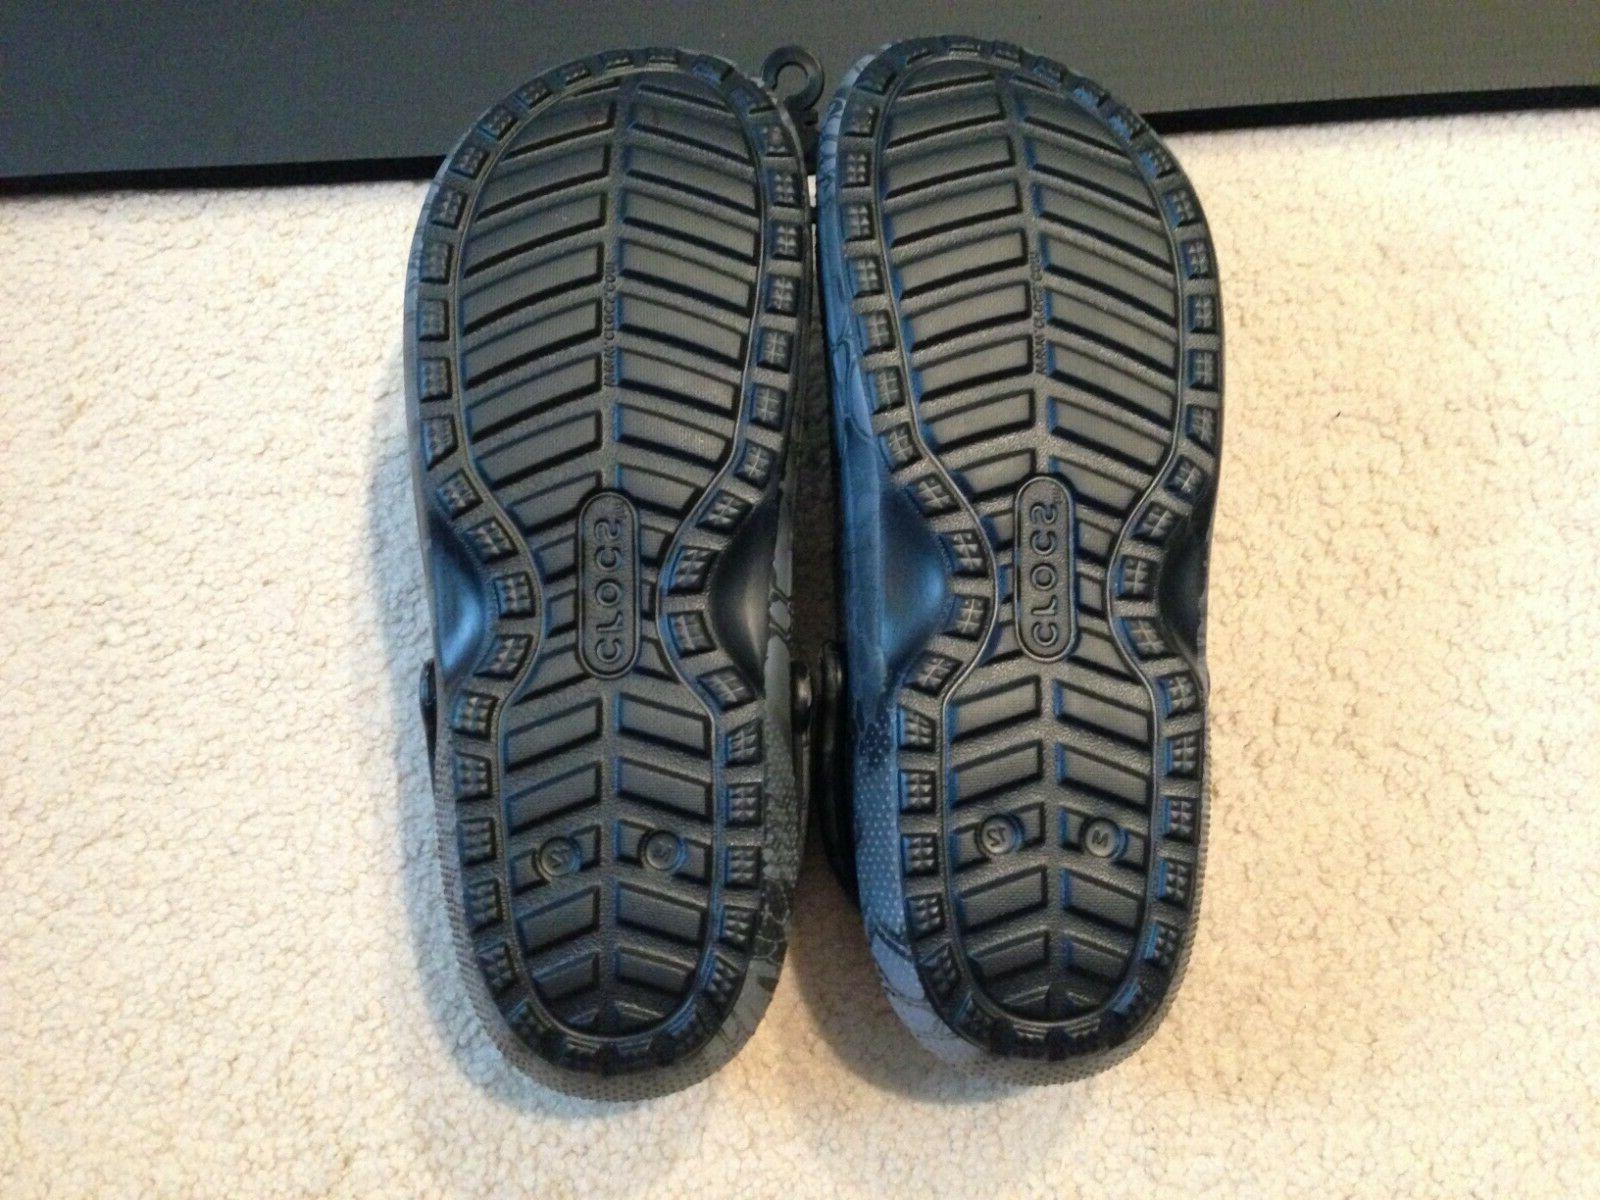 Crocs Fuzz Lined Clog Slippers